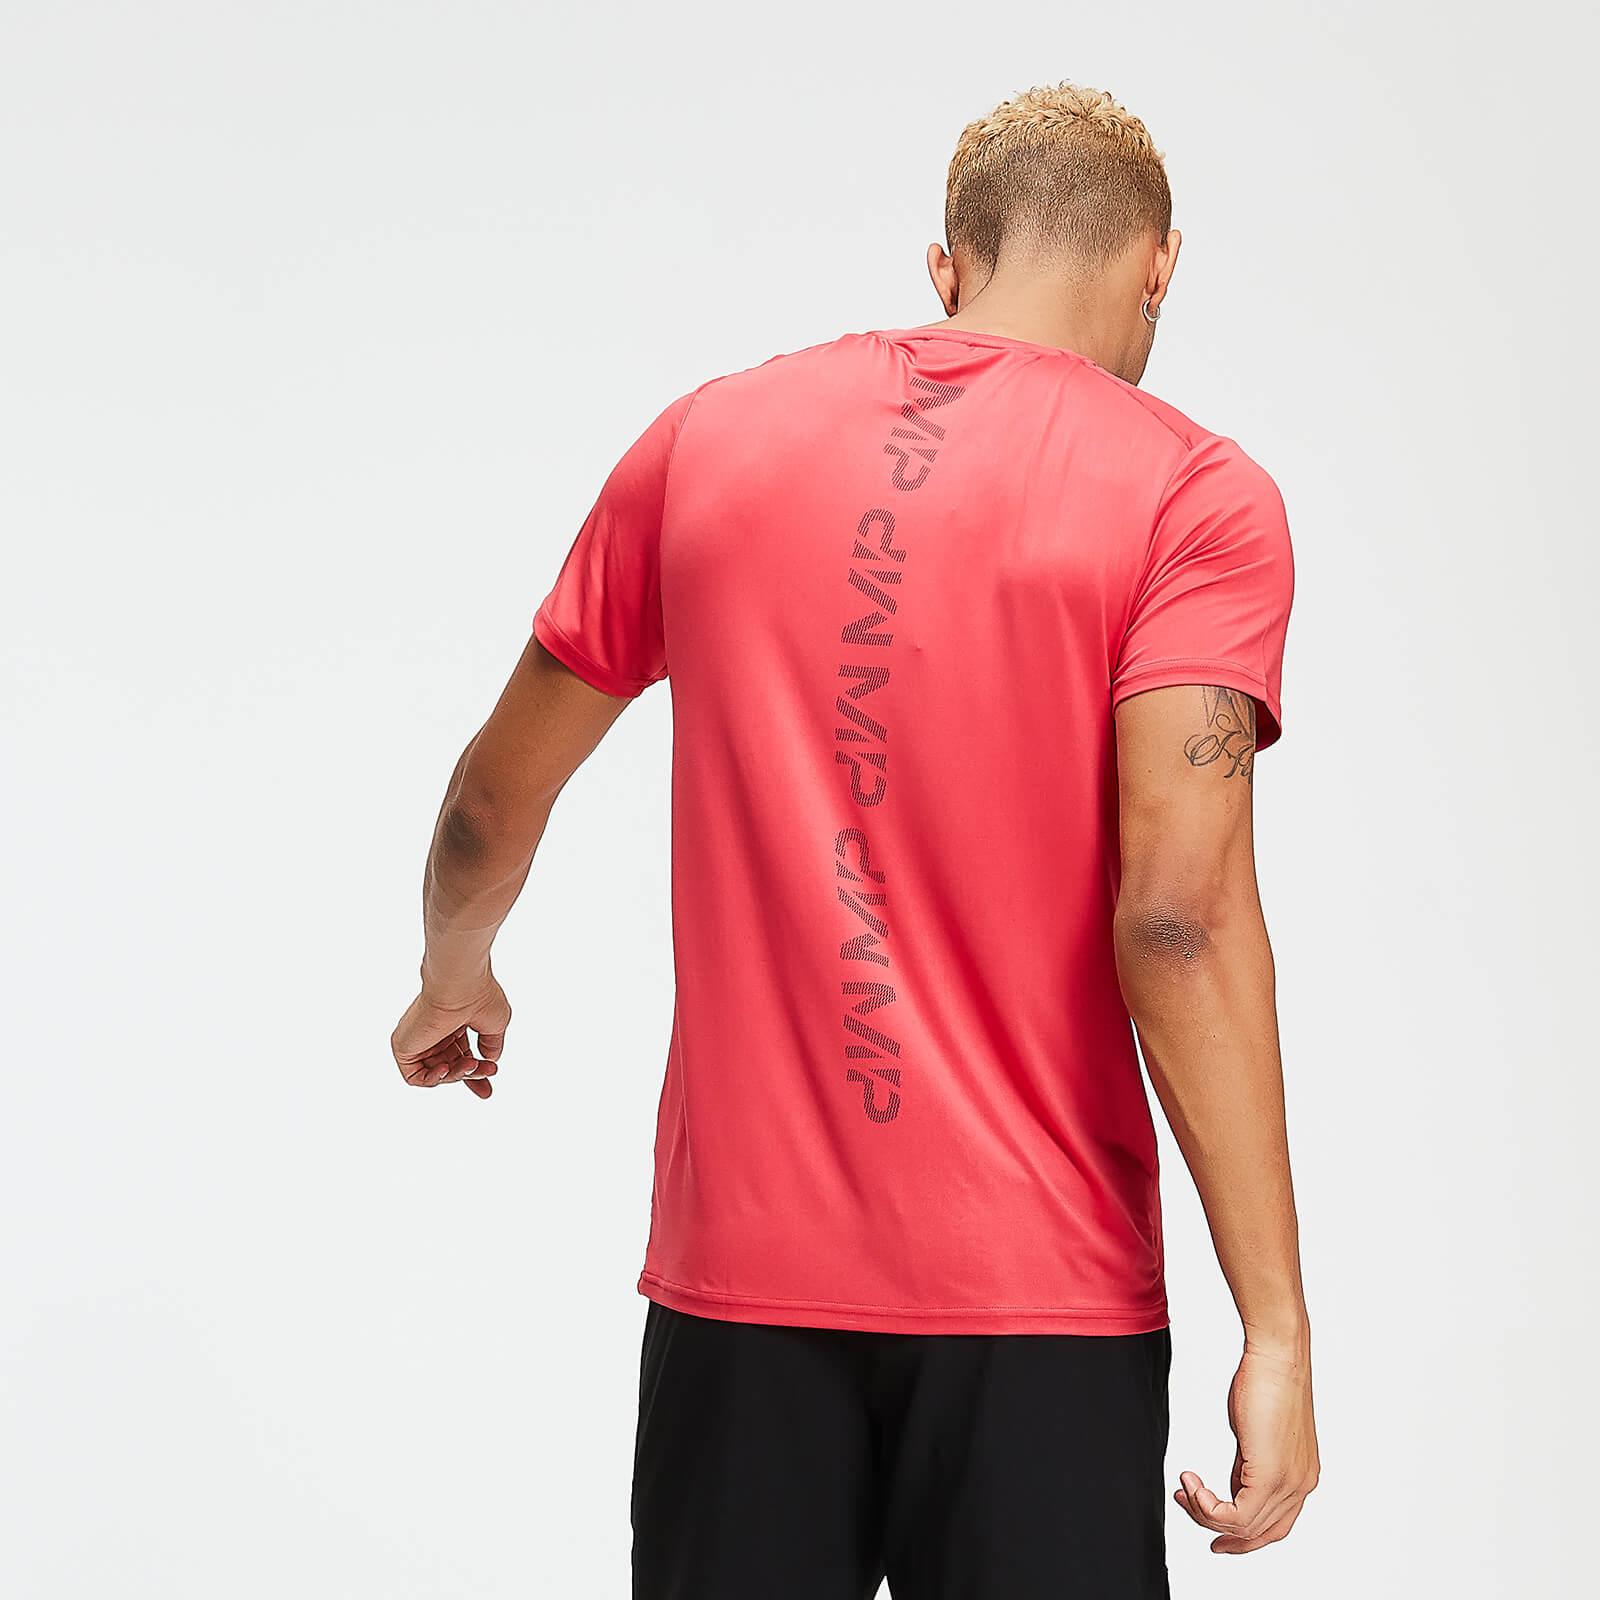 Myprotein MP Training Men's T-Shirt - Washed Red - XL